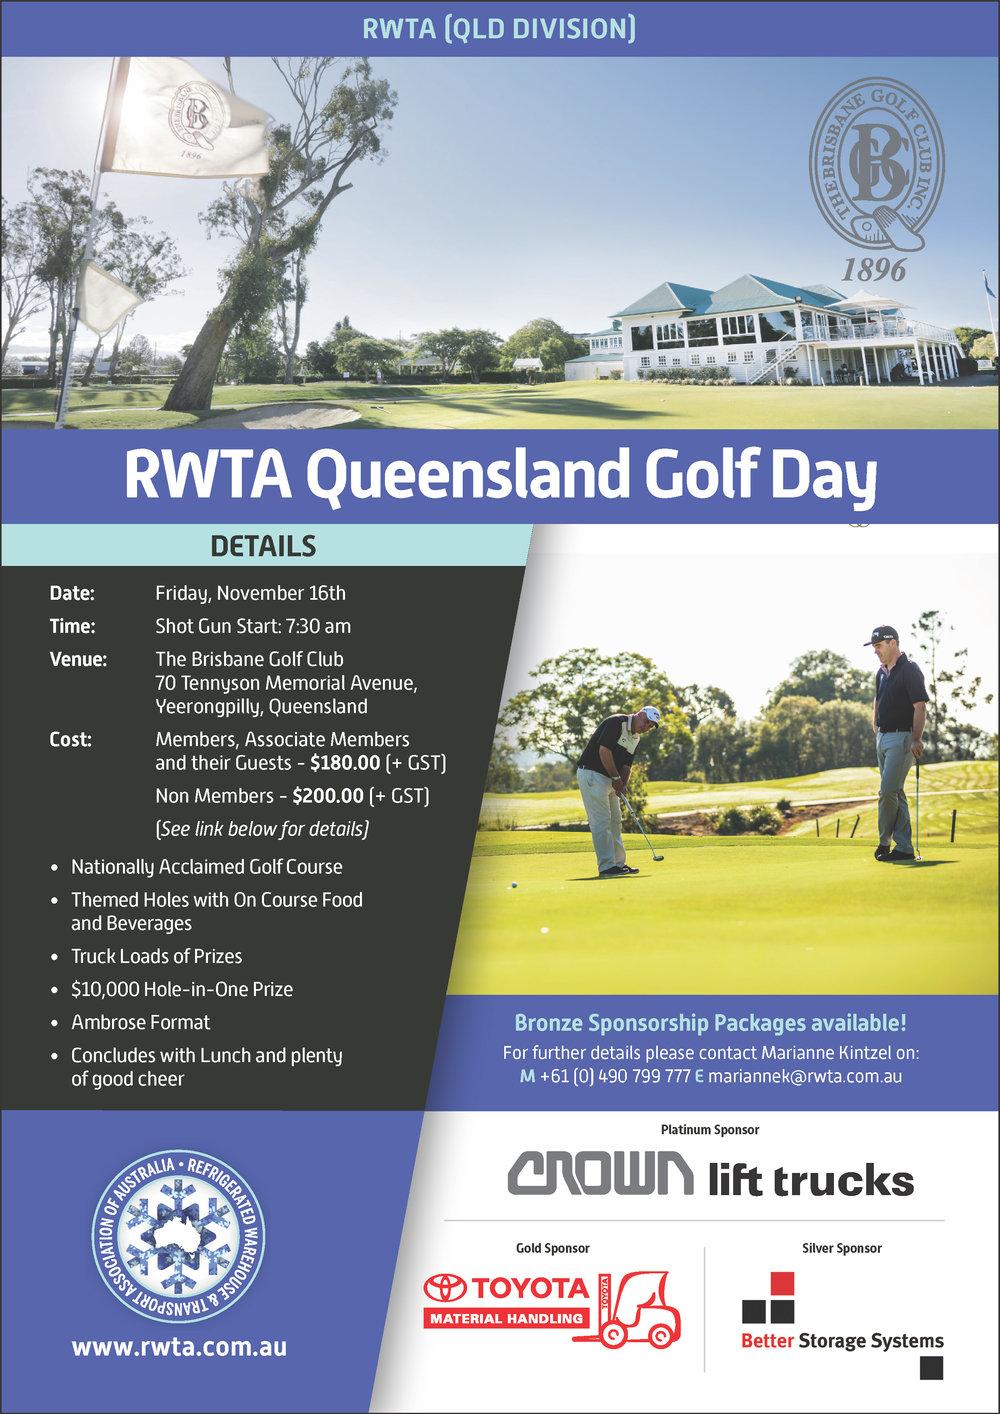 12321_RWTA_QLD Golf Day_eBlast_C_F.jpg